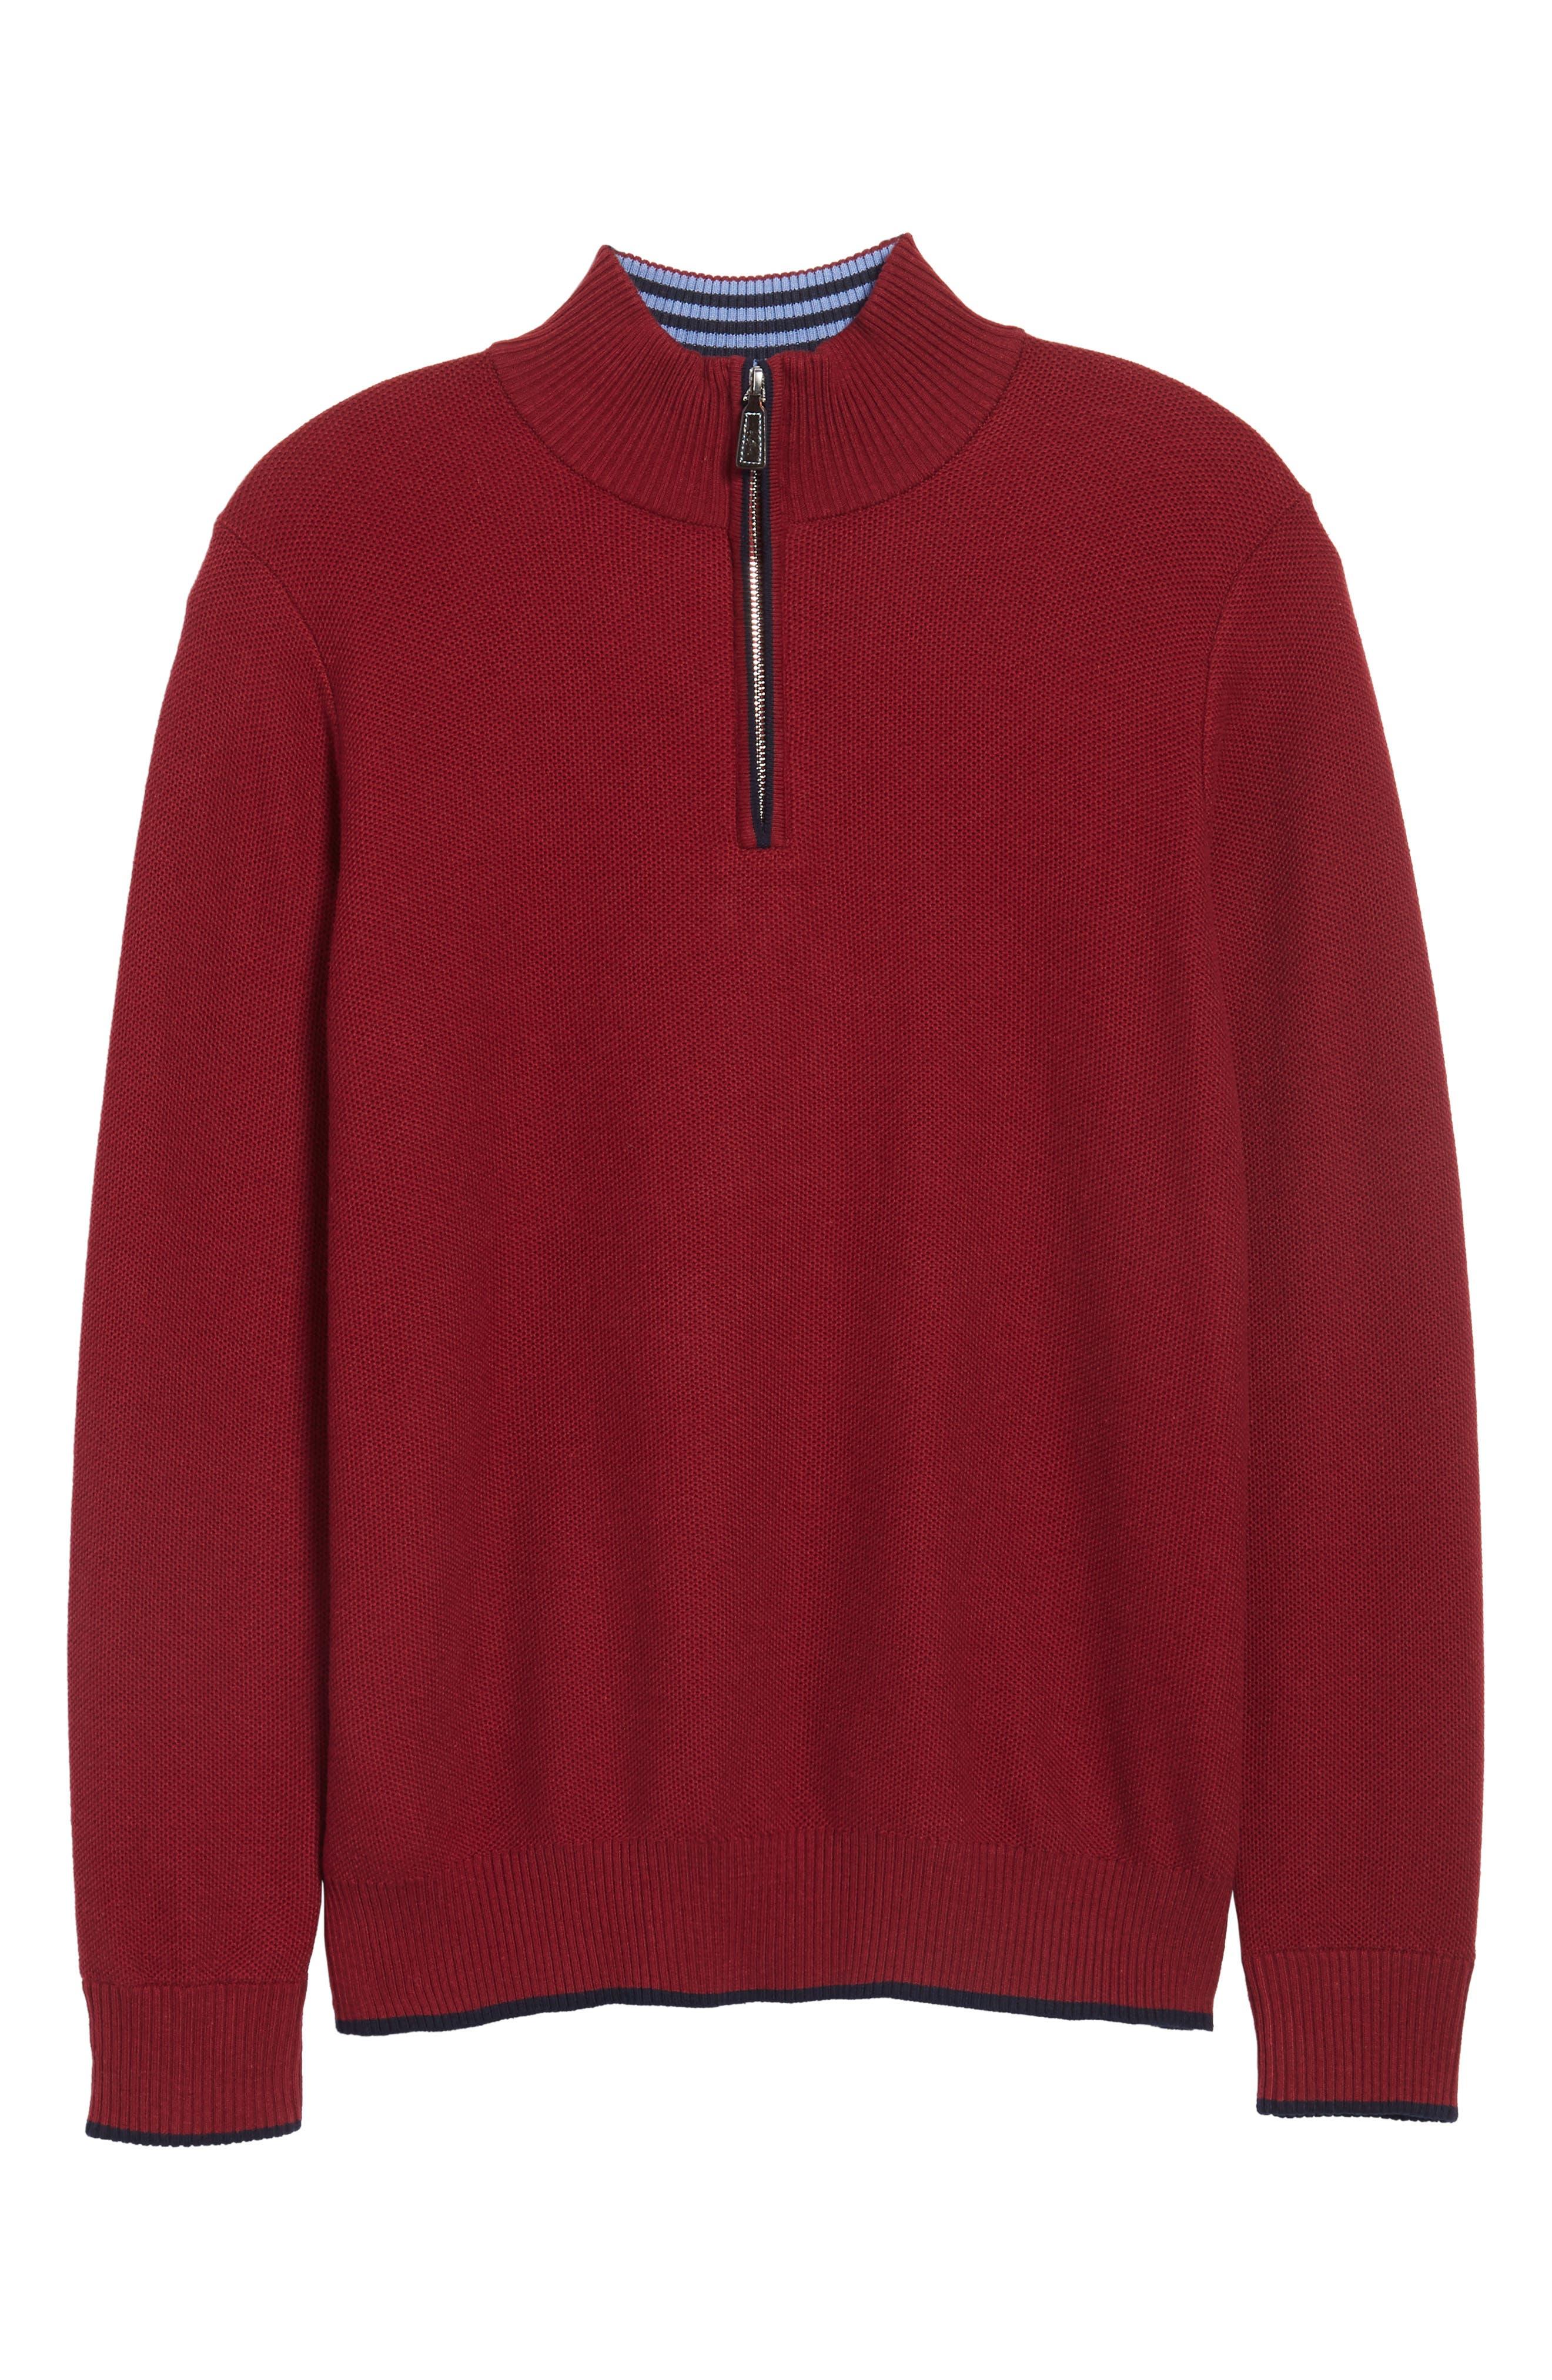 Prien Tipped Quarter Zip Sweater,                             Alternate thumbnail 6, color,                             600